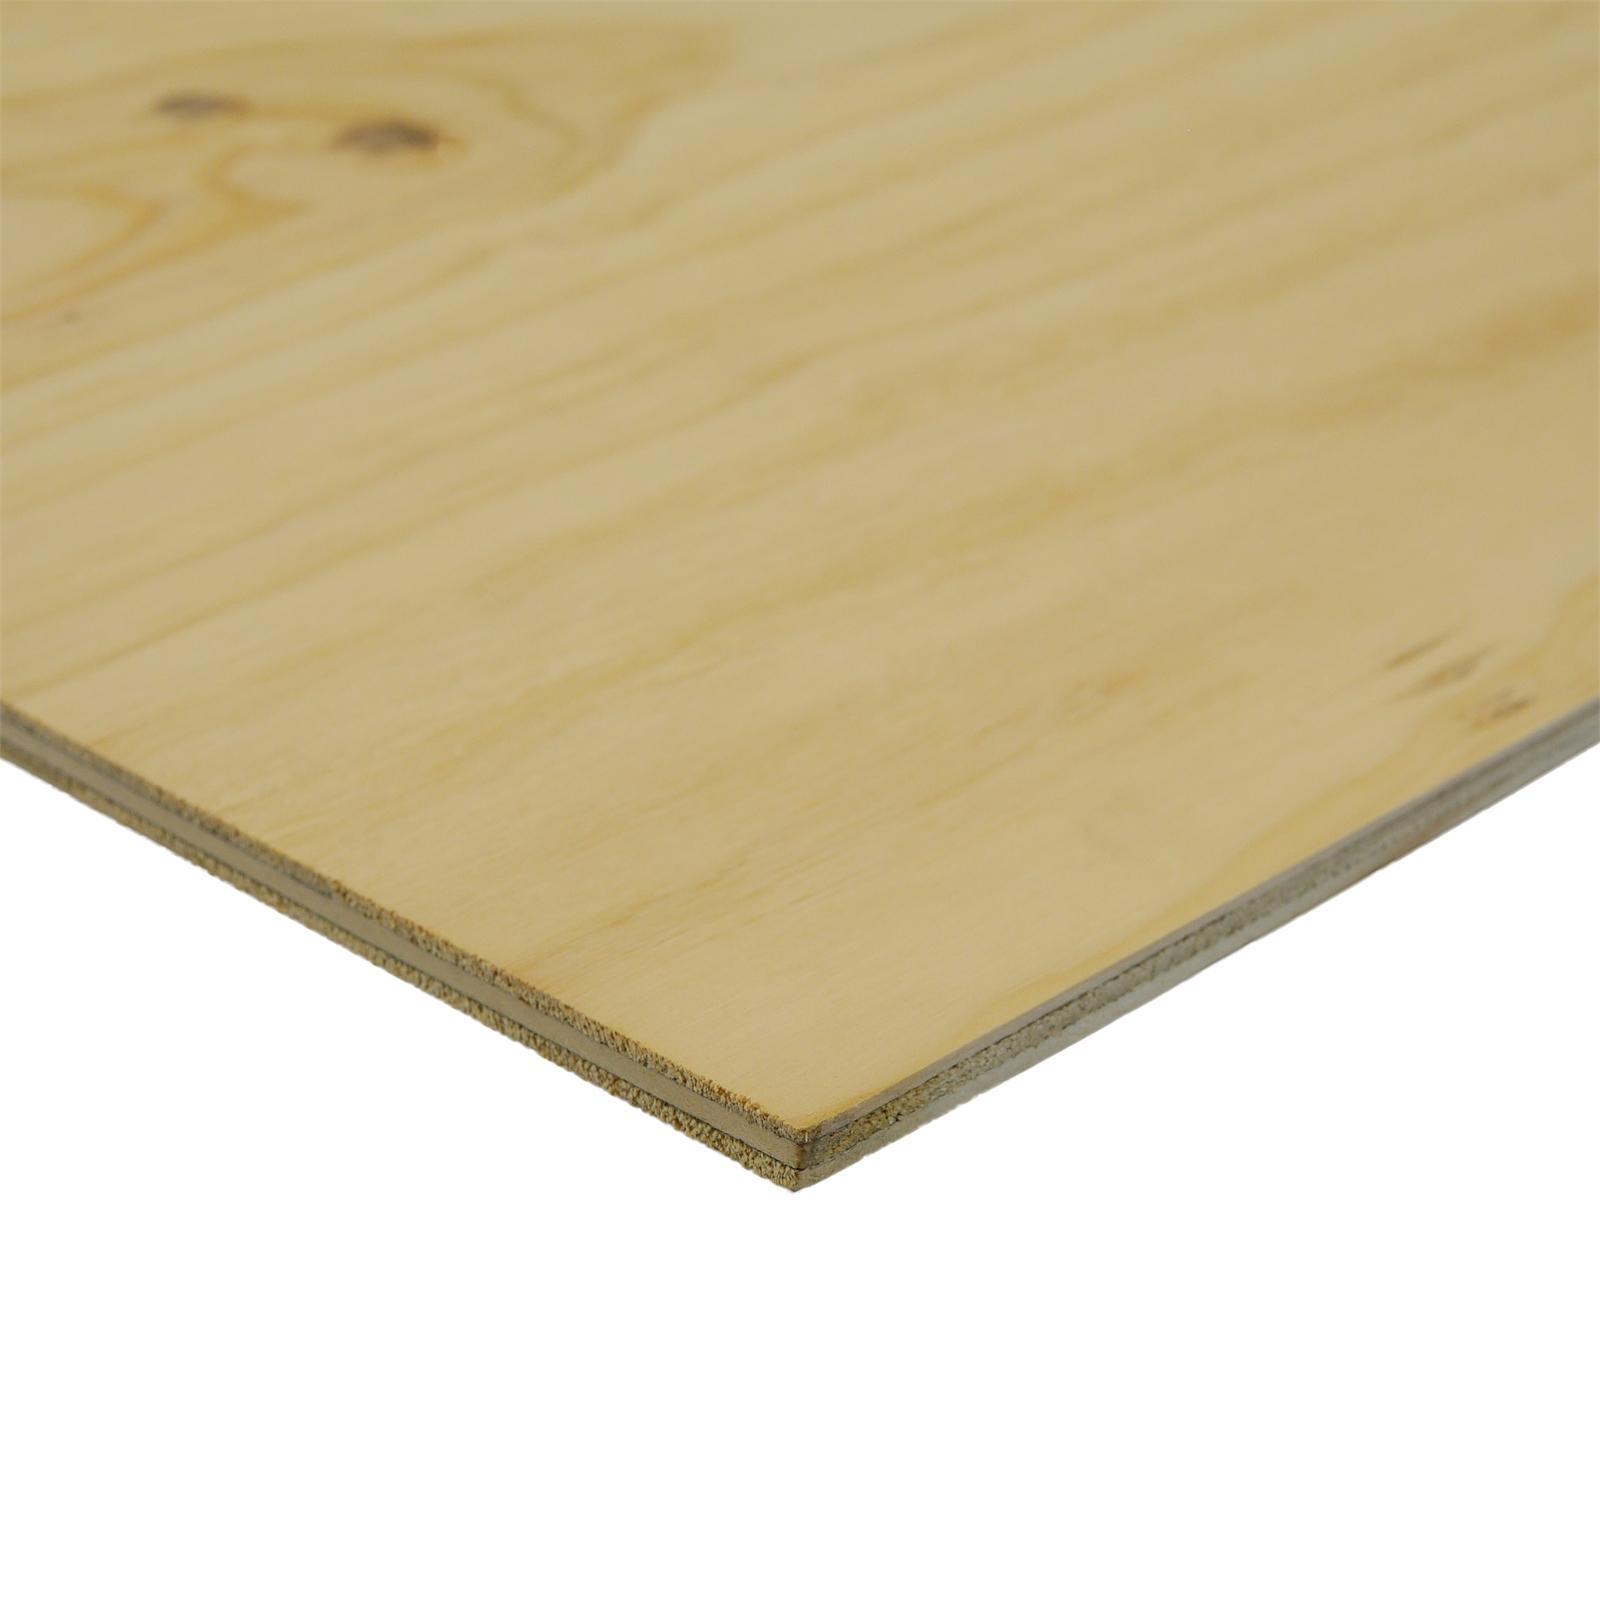 IBS Mini Panels 1200 x 600 x 12mm Untreated CD Plywood